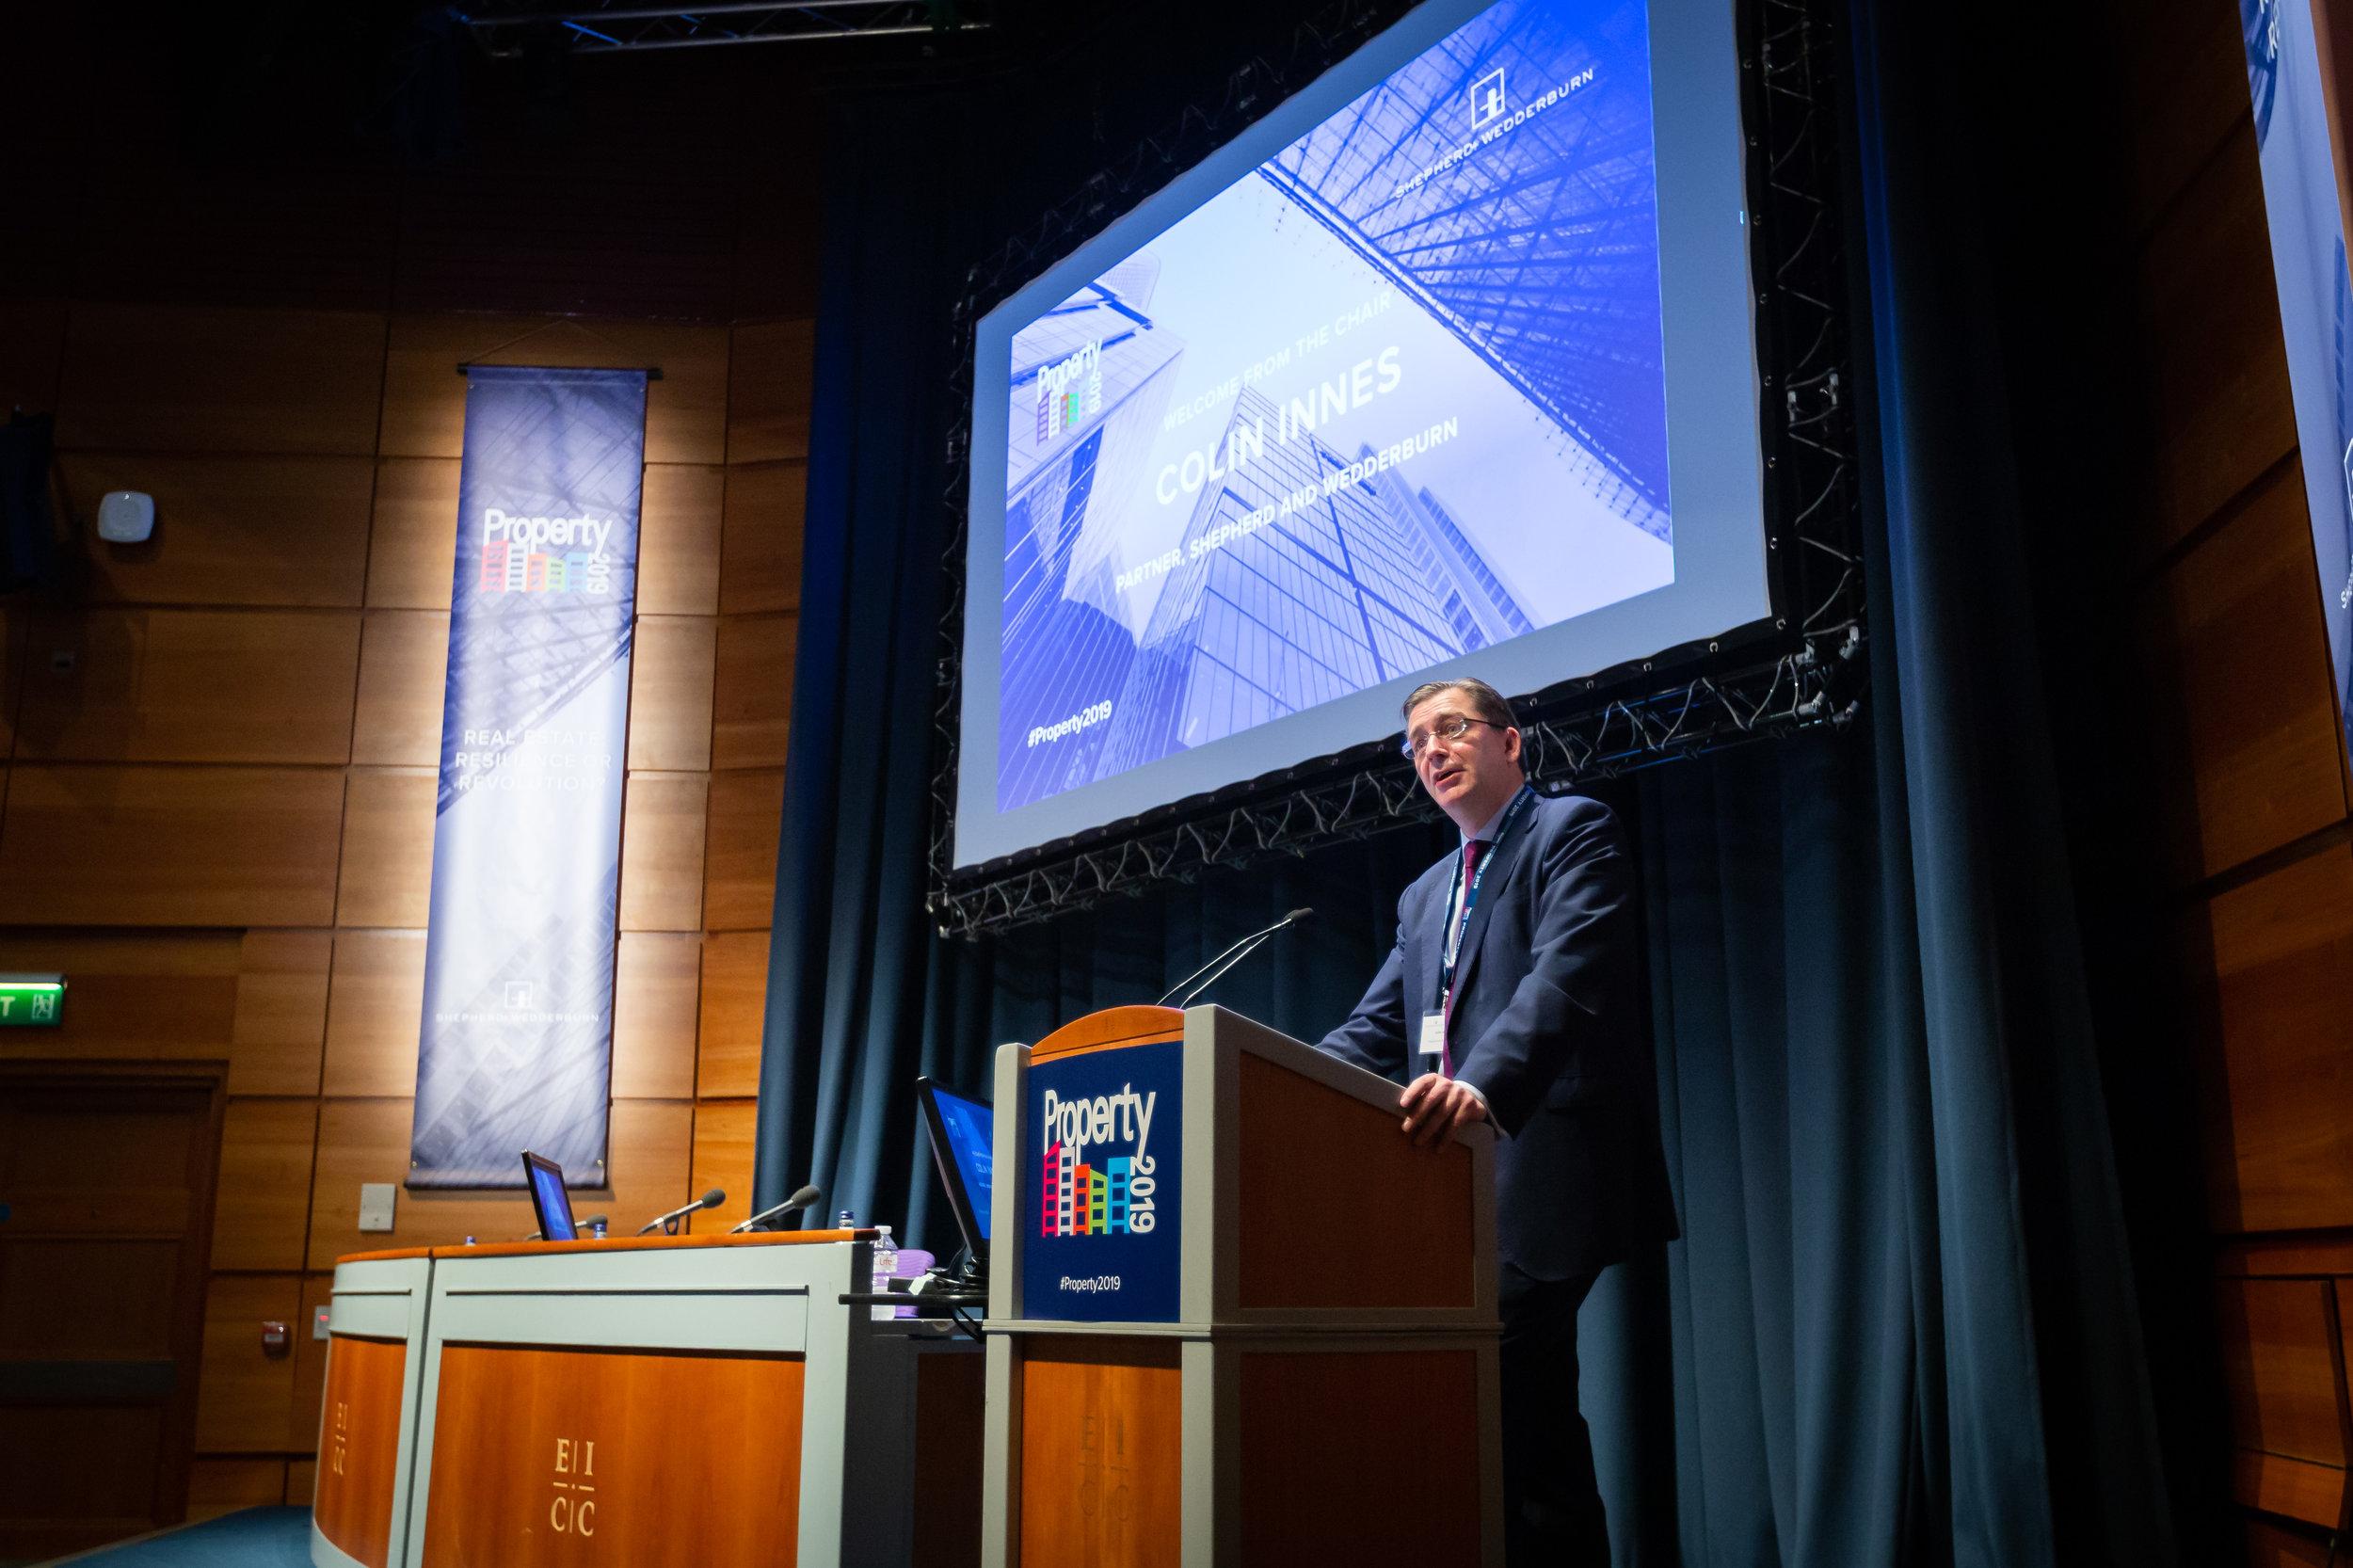 ShepherdandWedderburnPropertyConference2019-35.jpg